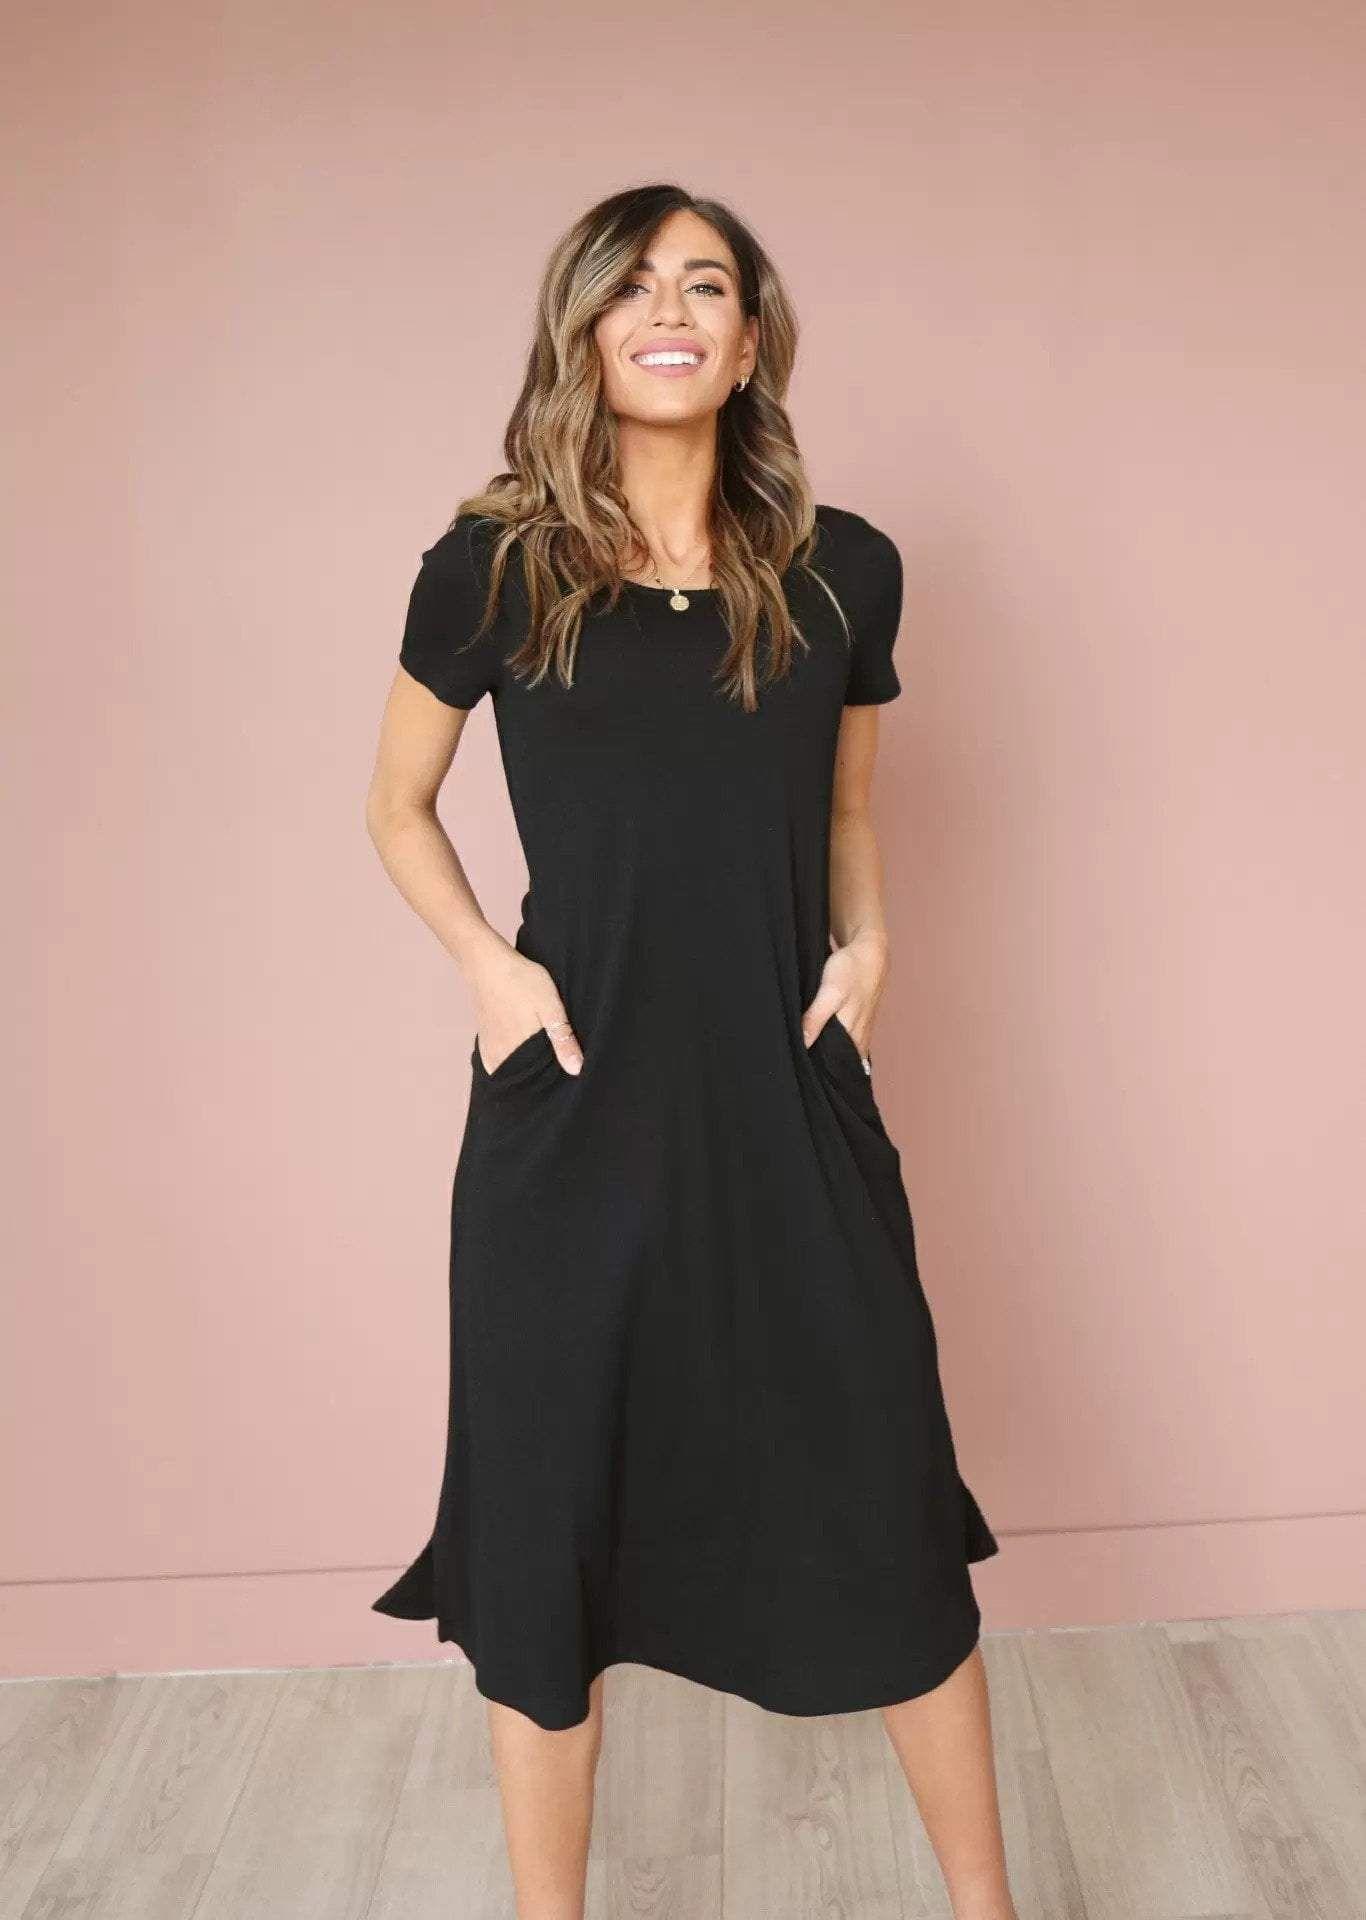 Raven Dress Black In 2021 Modest Dresses Black Dresses Classy Modest Black Dress [ 1920 x 1366 Pixel ]